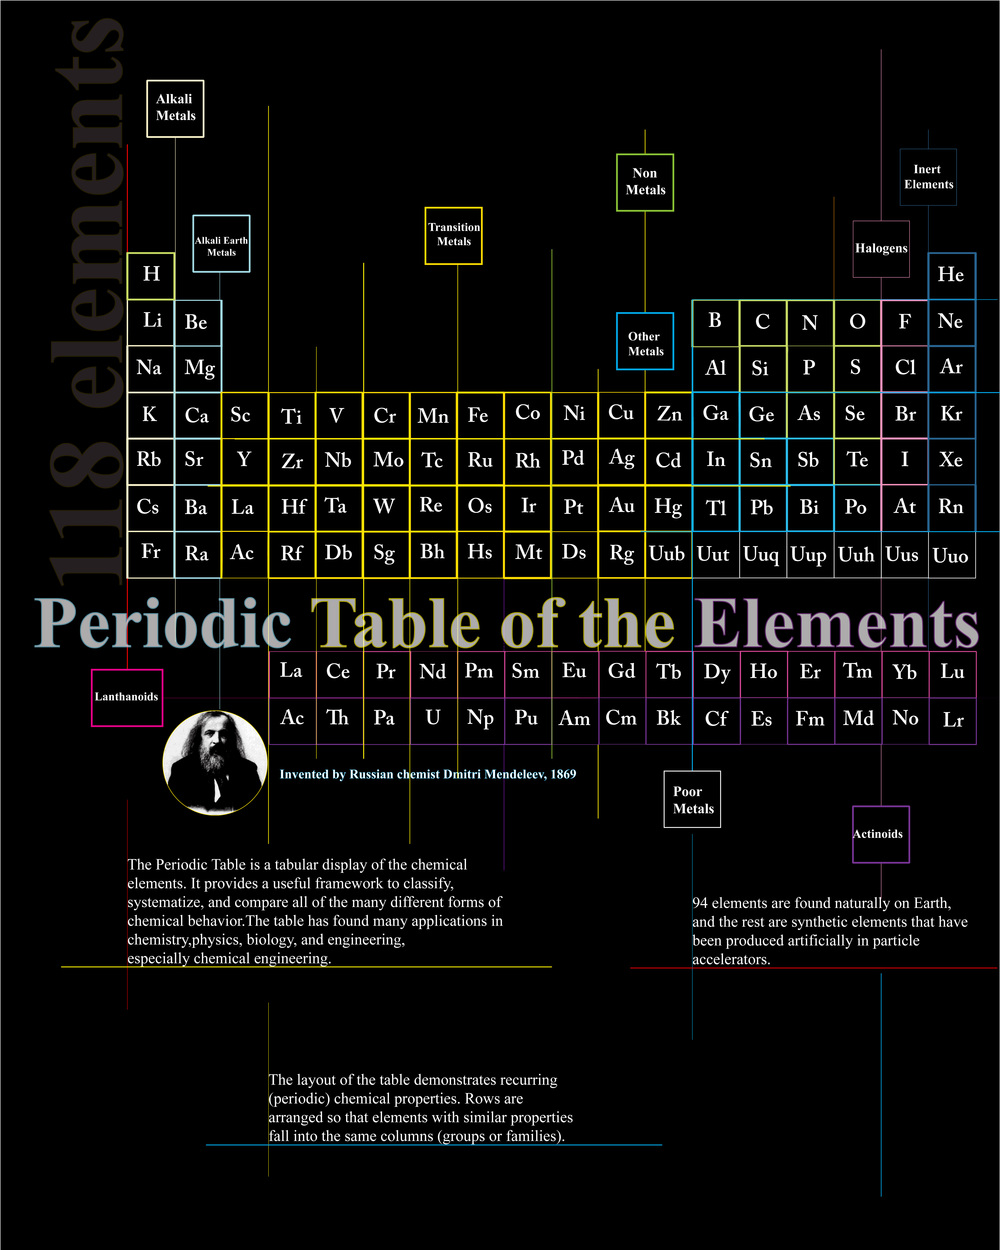 periodic table .jpg